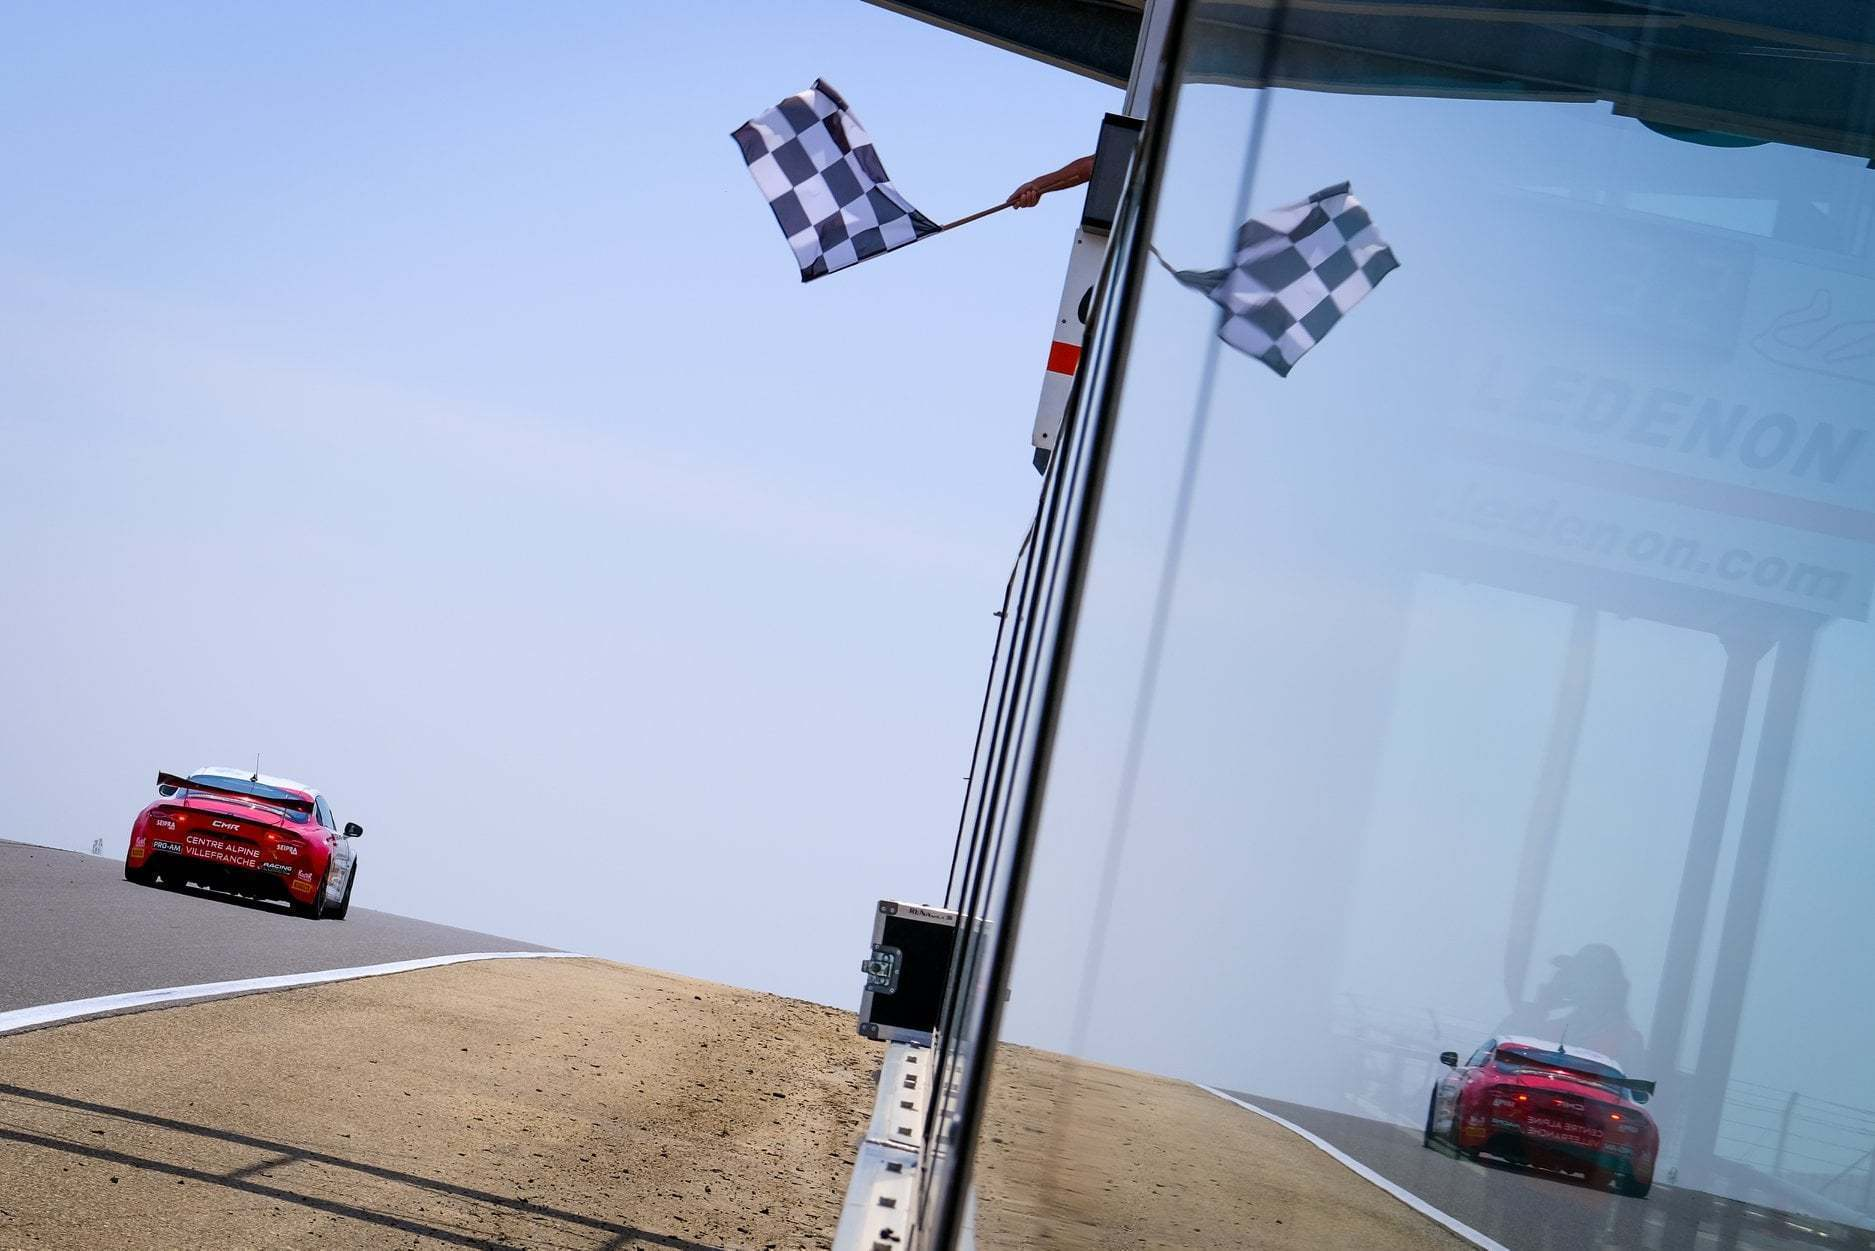 FFSA GT: CMR reprend la main Lédenon ! (Course 2) 21